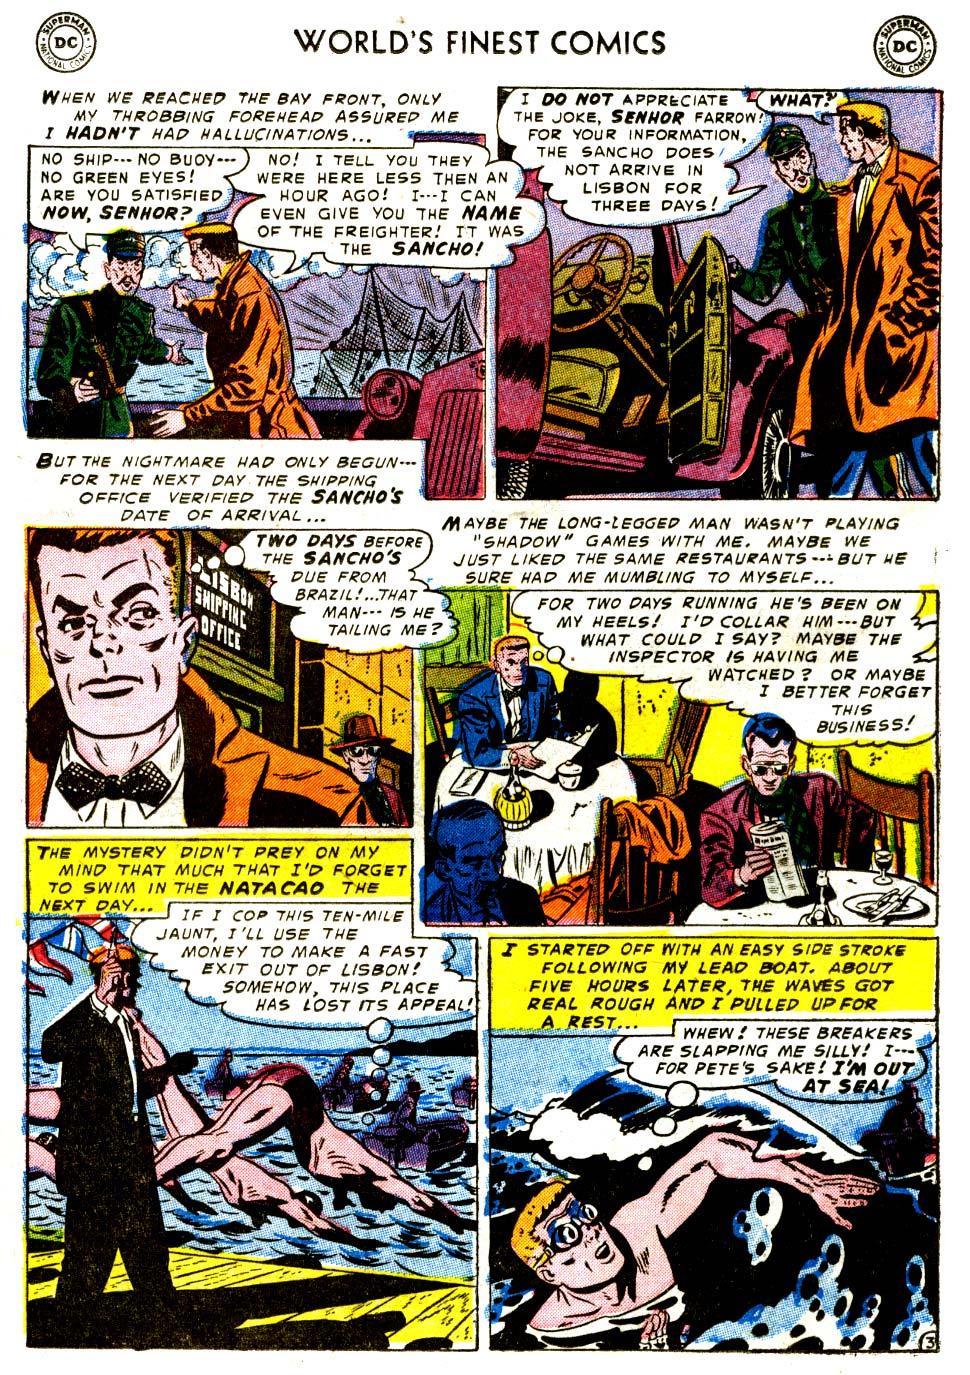 Read online World's Finest Comics comic -  Issue #68 - 45